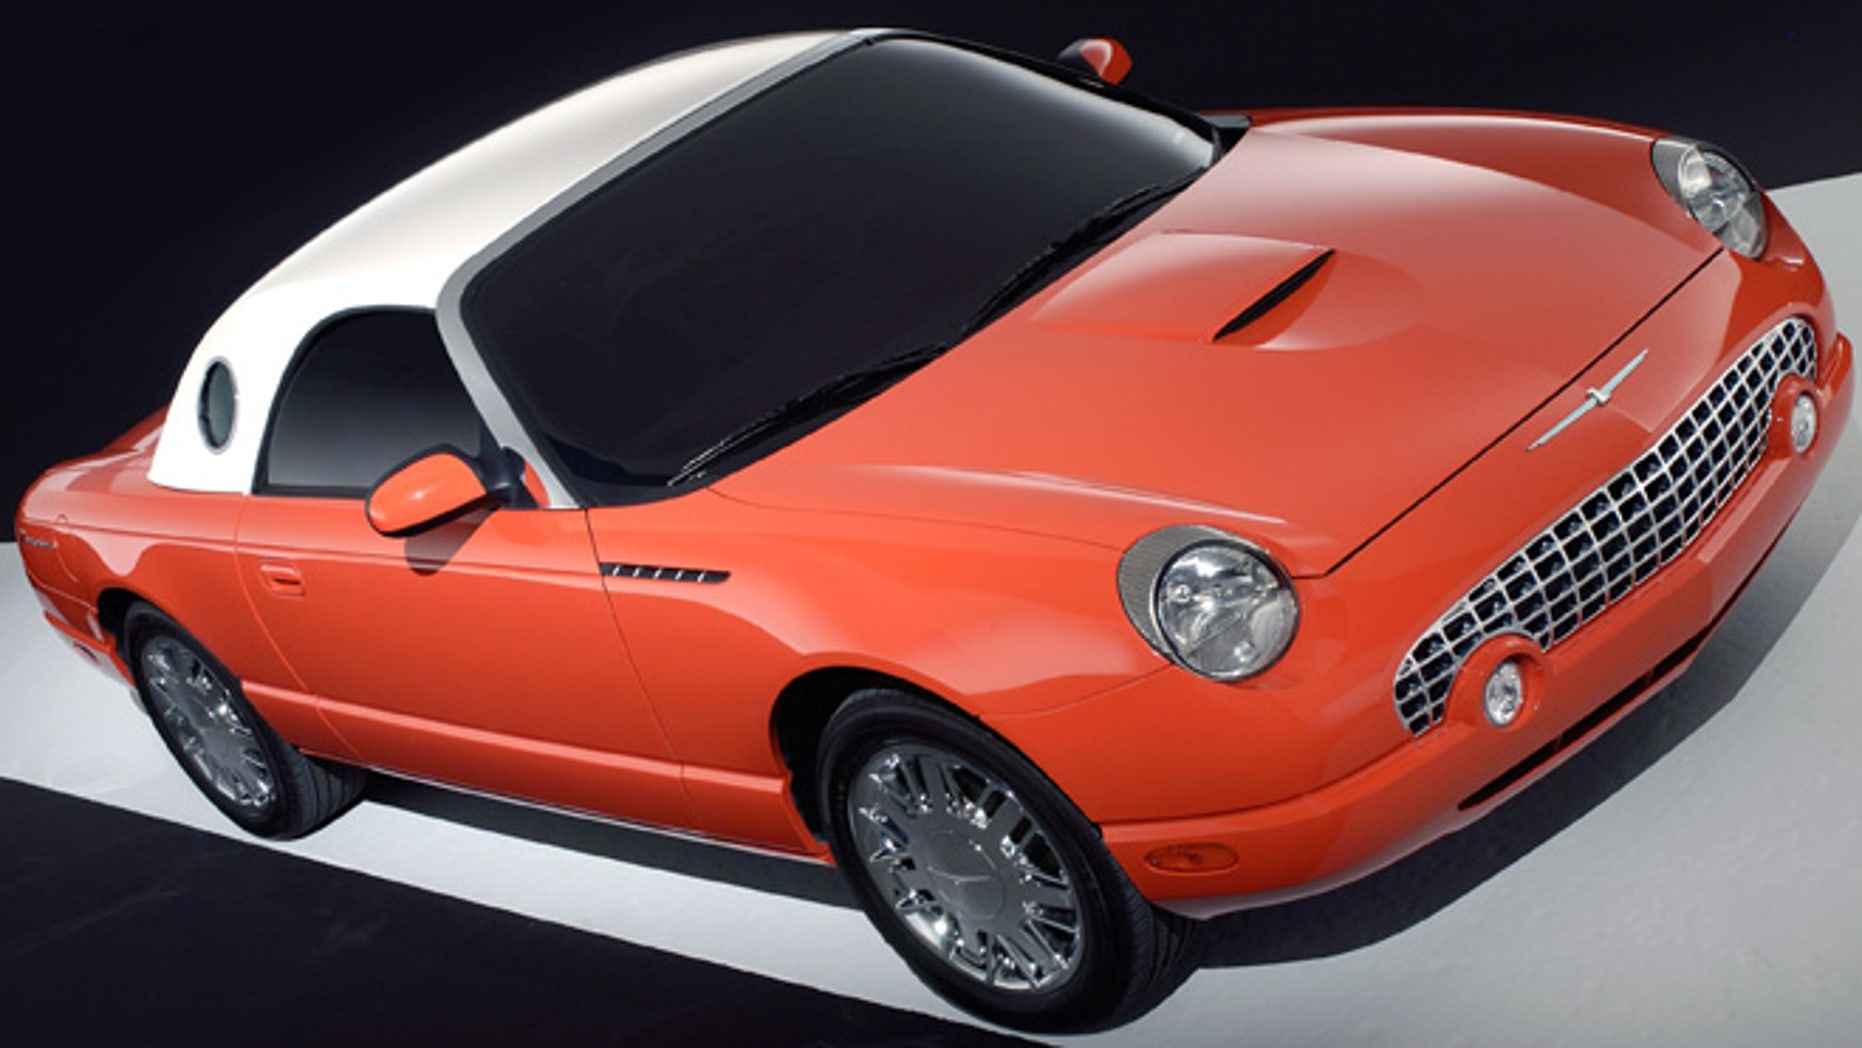 Limited Edition 007 Ford Thunderbird